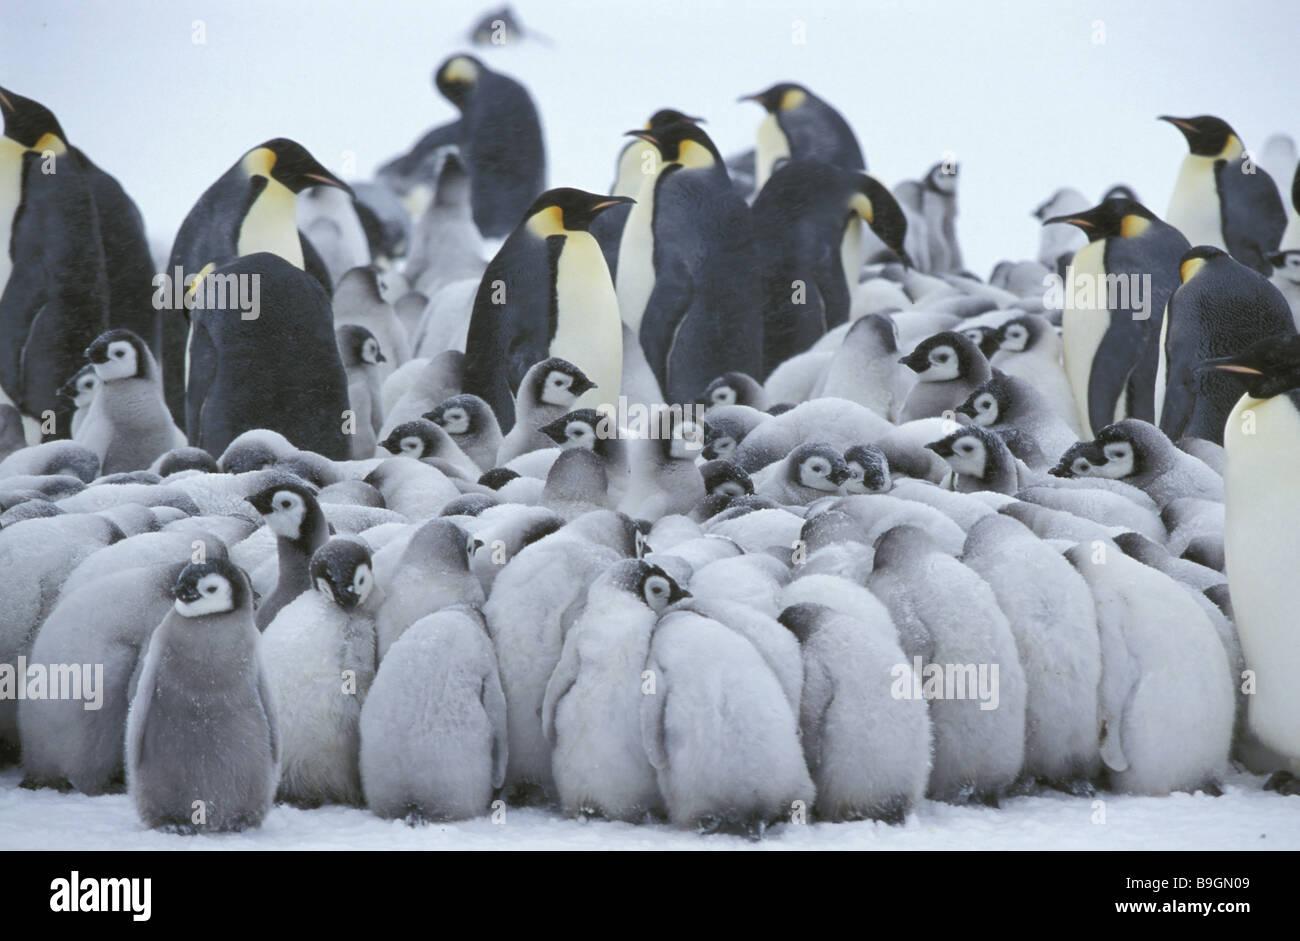 Emperor-penguins  Aptenodytes forsteri - Stock Image